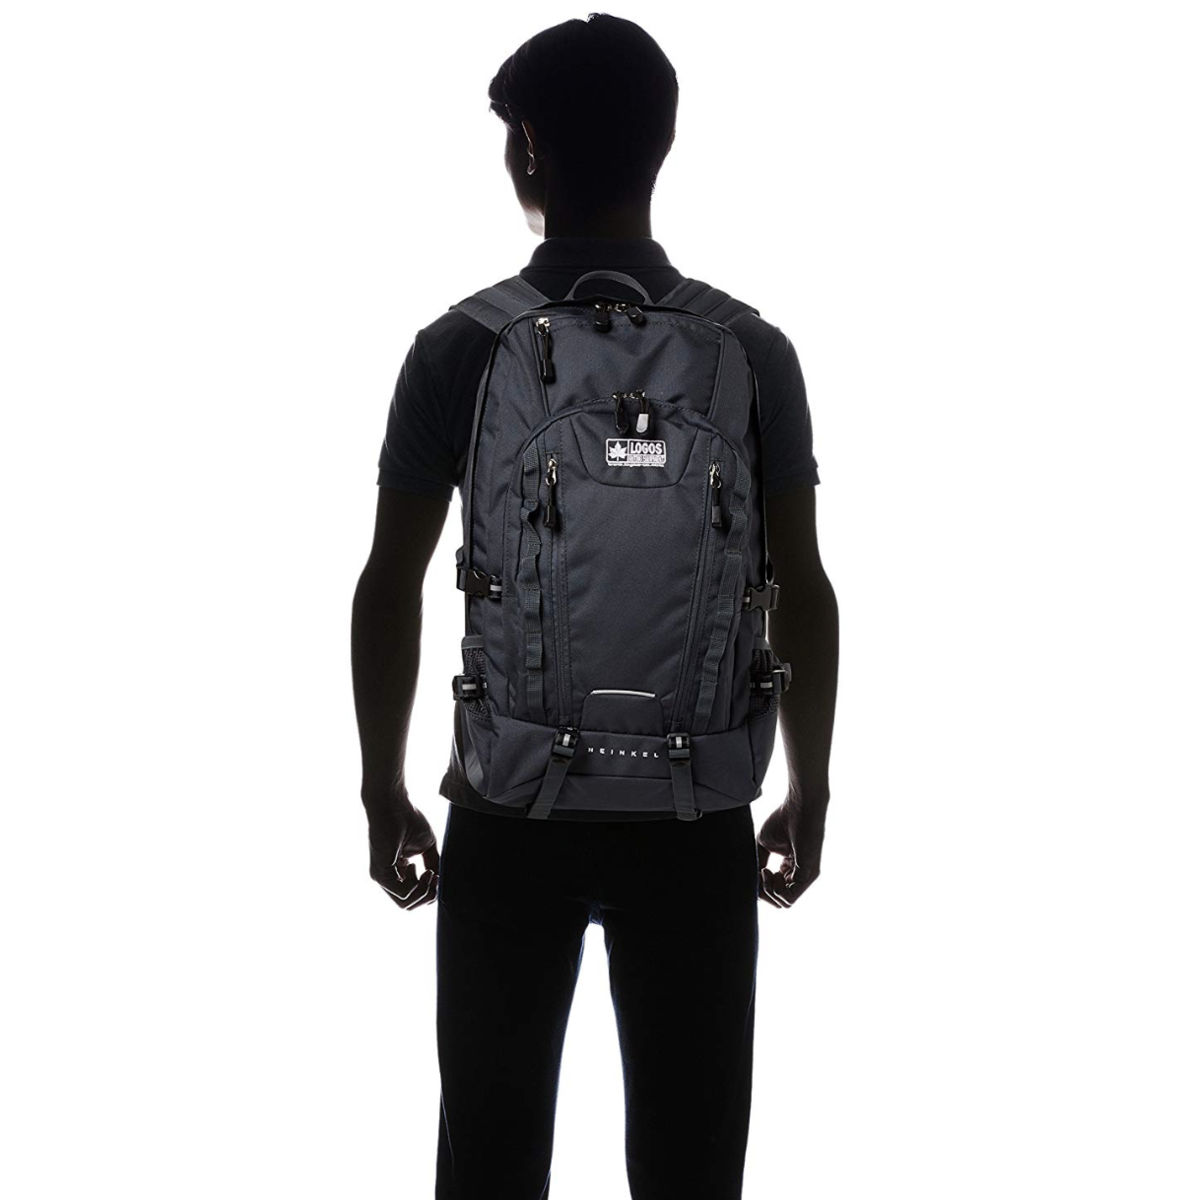 f:id:thebackpack:20190315203929p:plain